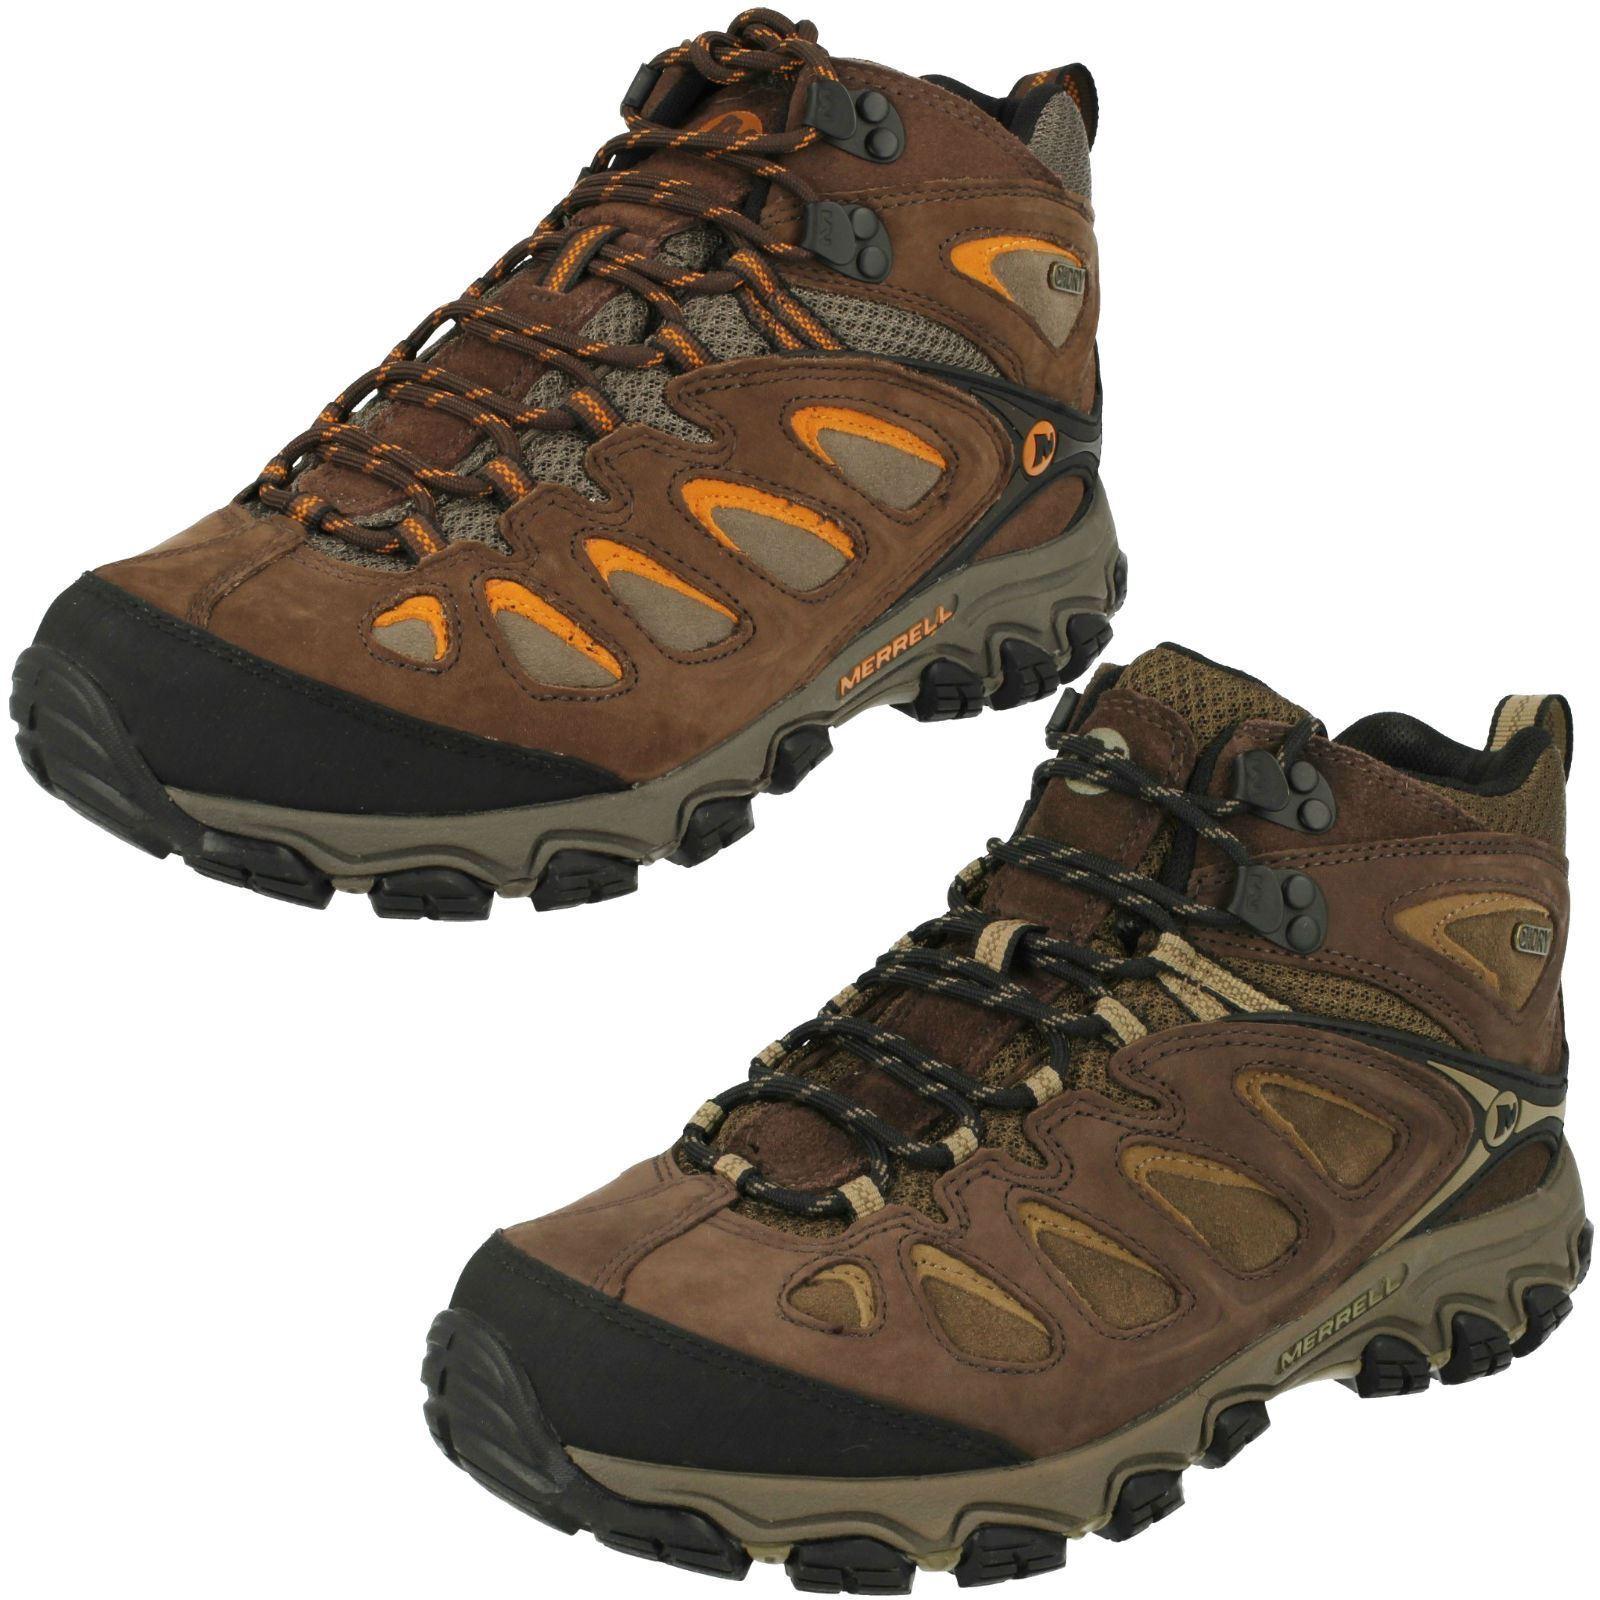 Mens Merrell Waterproof Walking Boots Pulsate Mid Waterproof